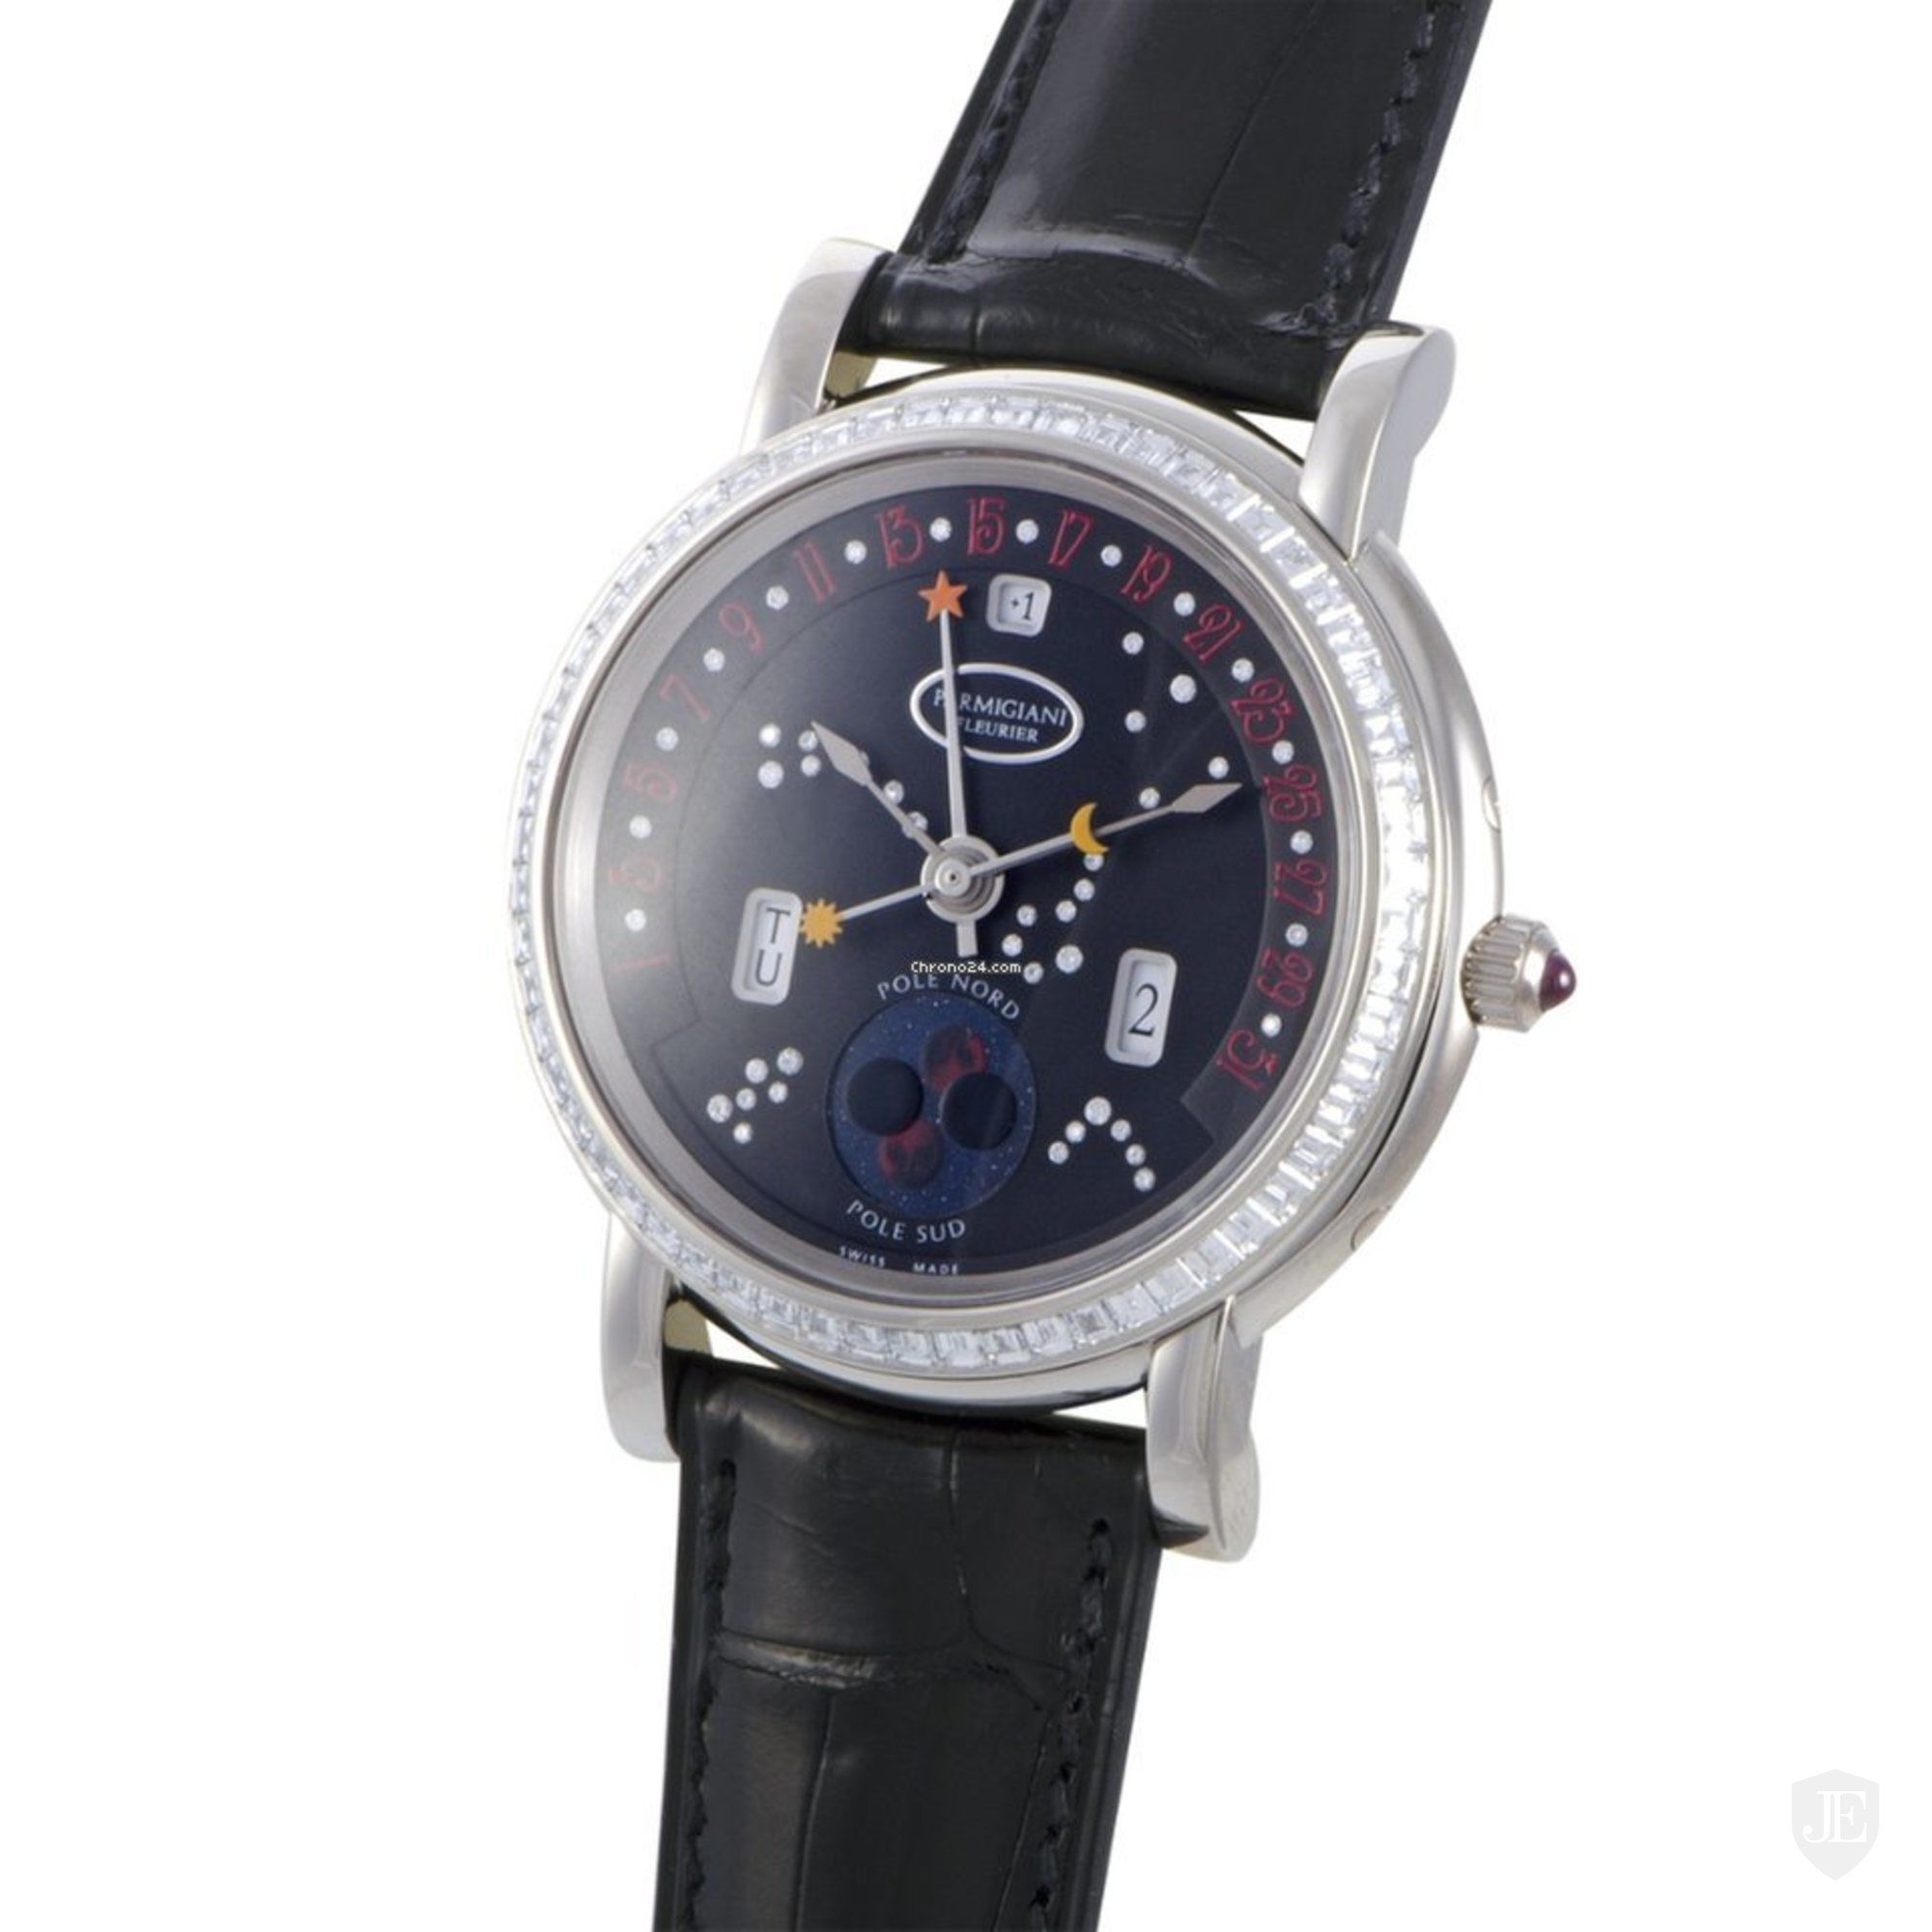 Parmigiani Fleurier Toric Retrograde Perpetual Calendar Watch